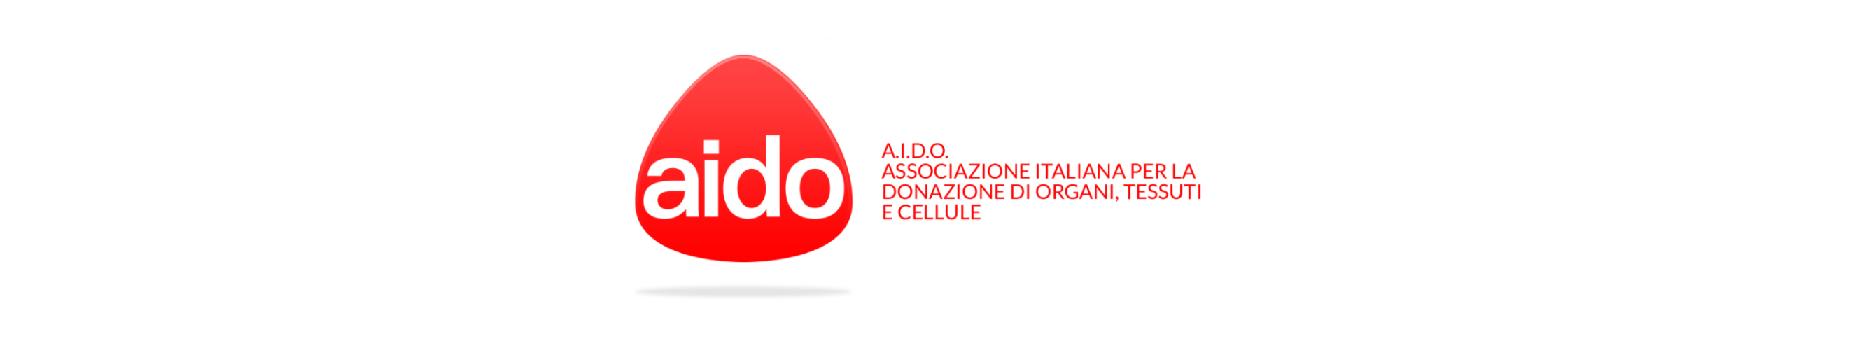 A.I.D.O. - Associazione Italiana Donatori Organi, tessuti e cellule ONLUS - logo